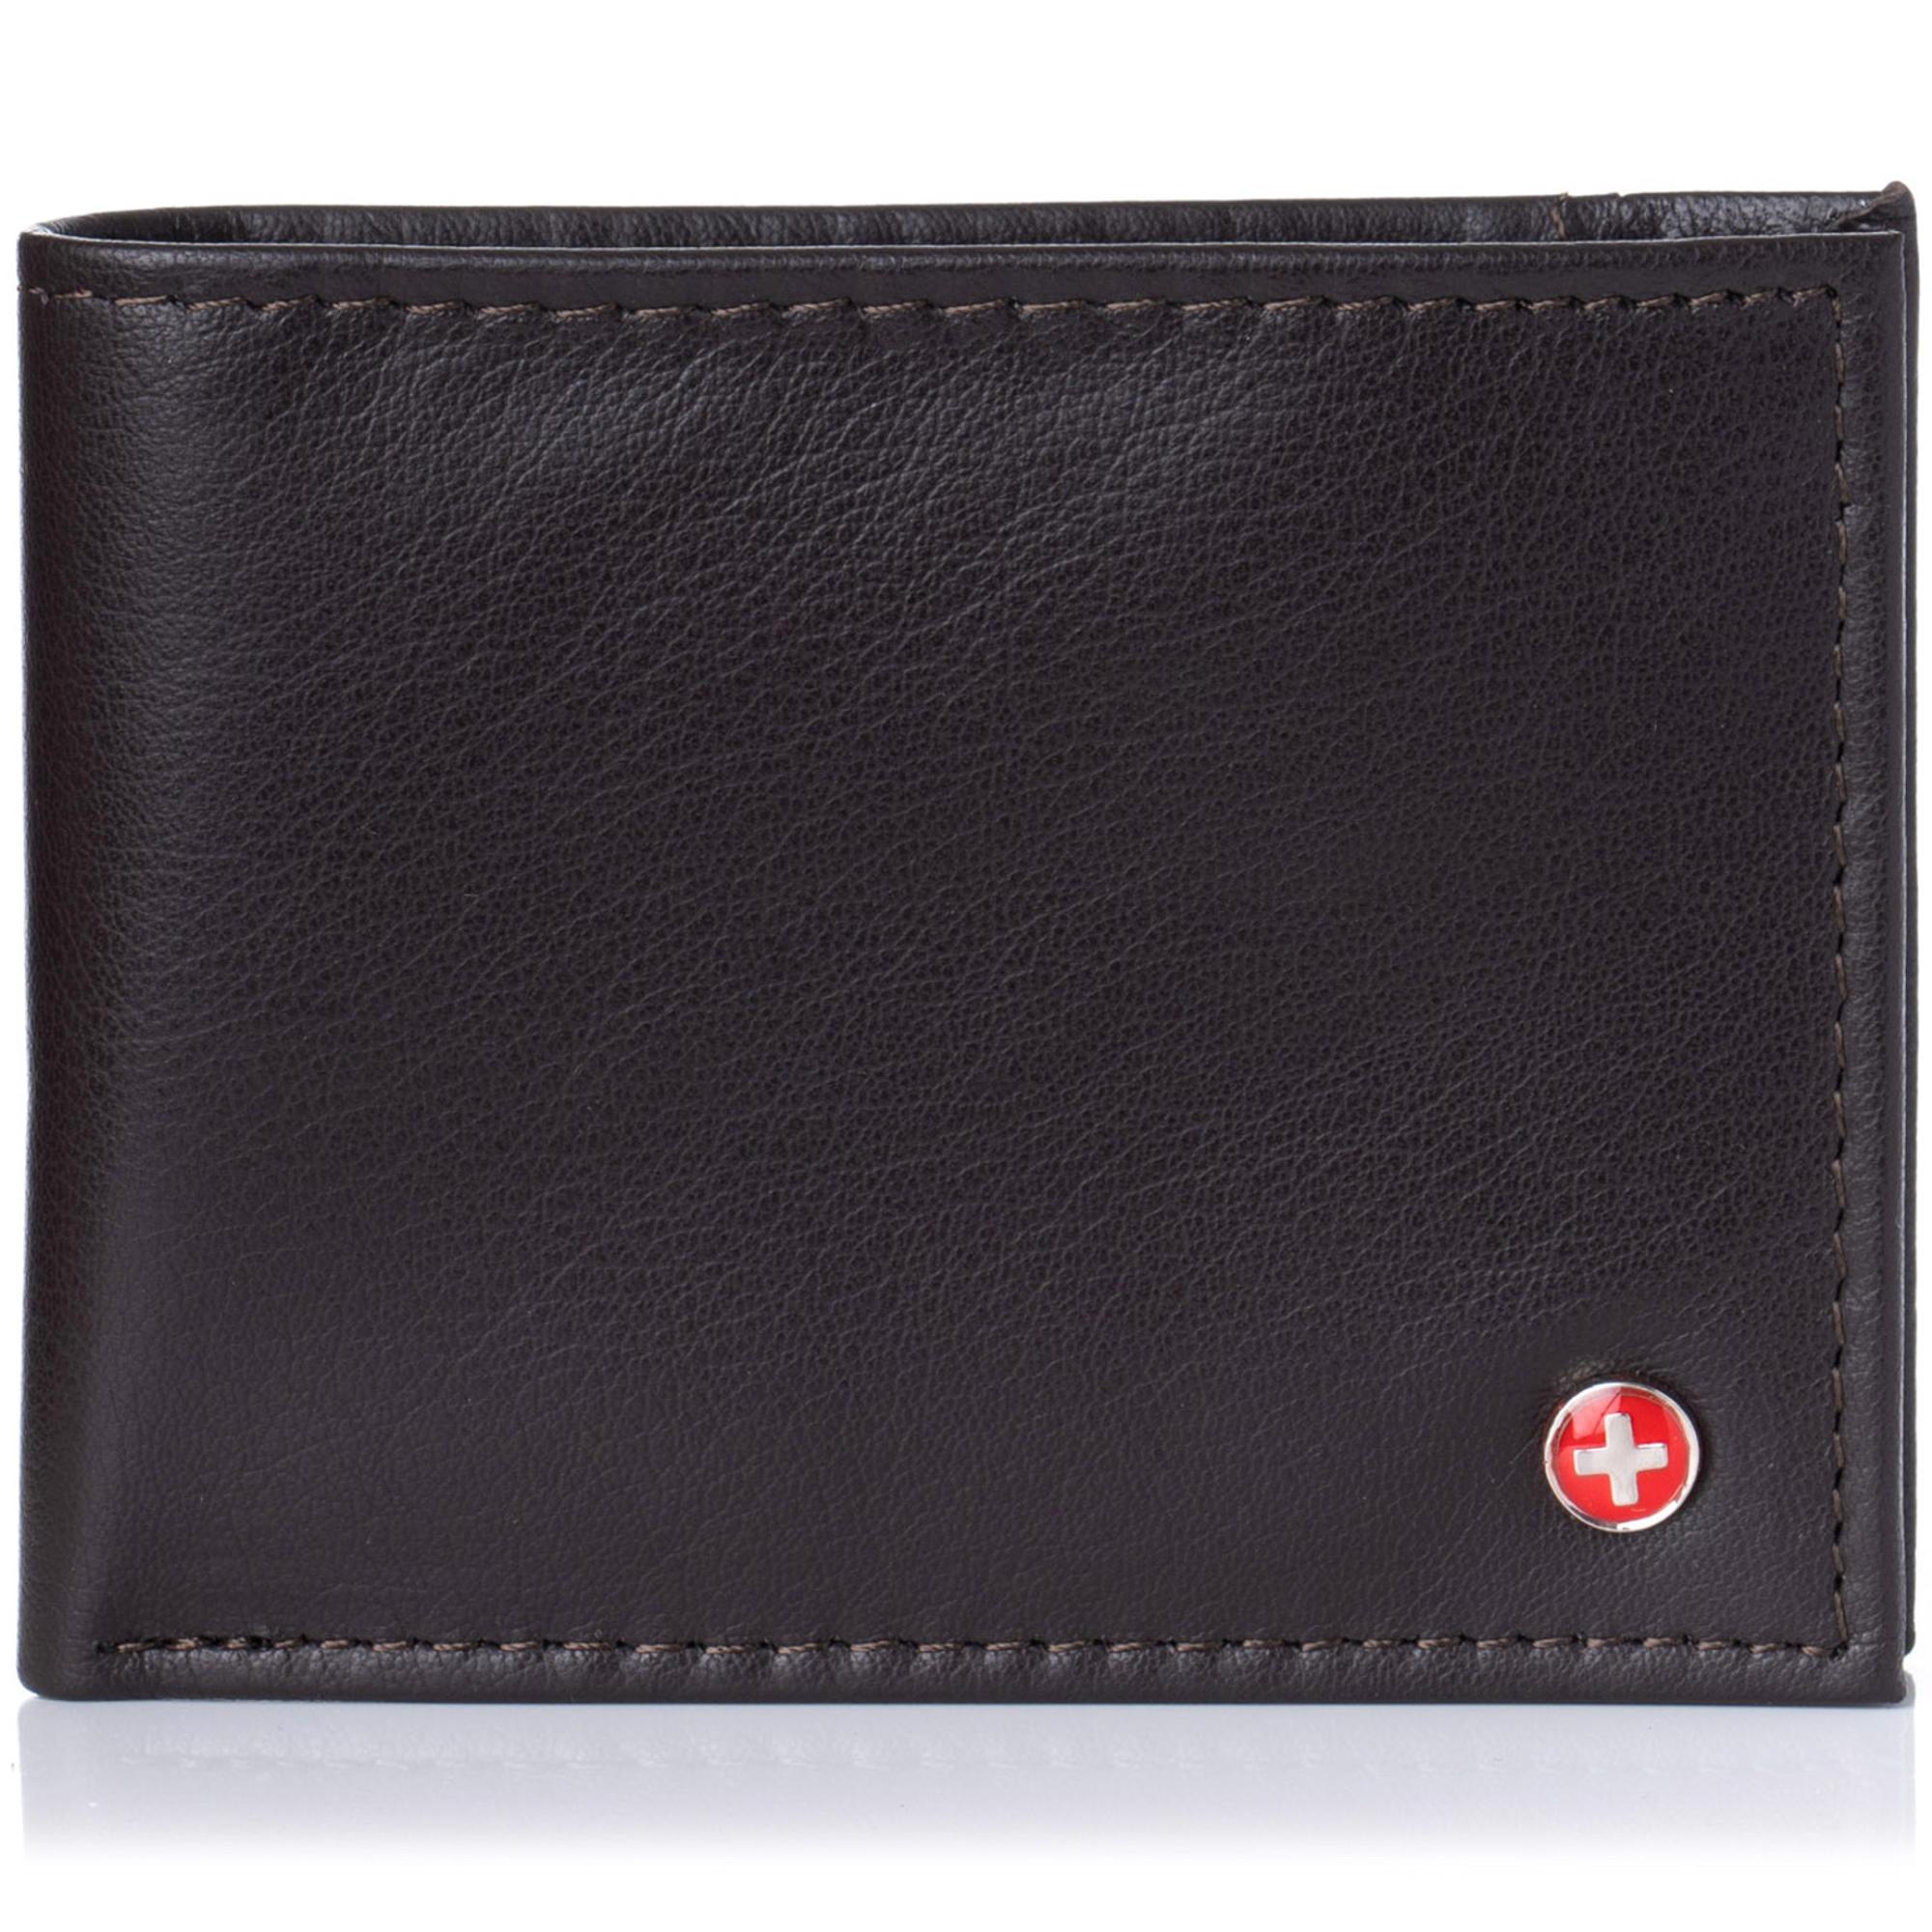 Alpine-Swiss-Mens-Thin-Bifold-Wallet-Top-Grain-Leather-EZ-Access-Outer-Card-Slot thumbnail 35